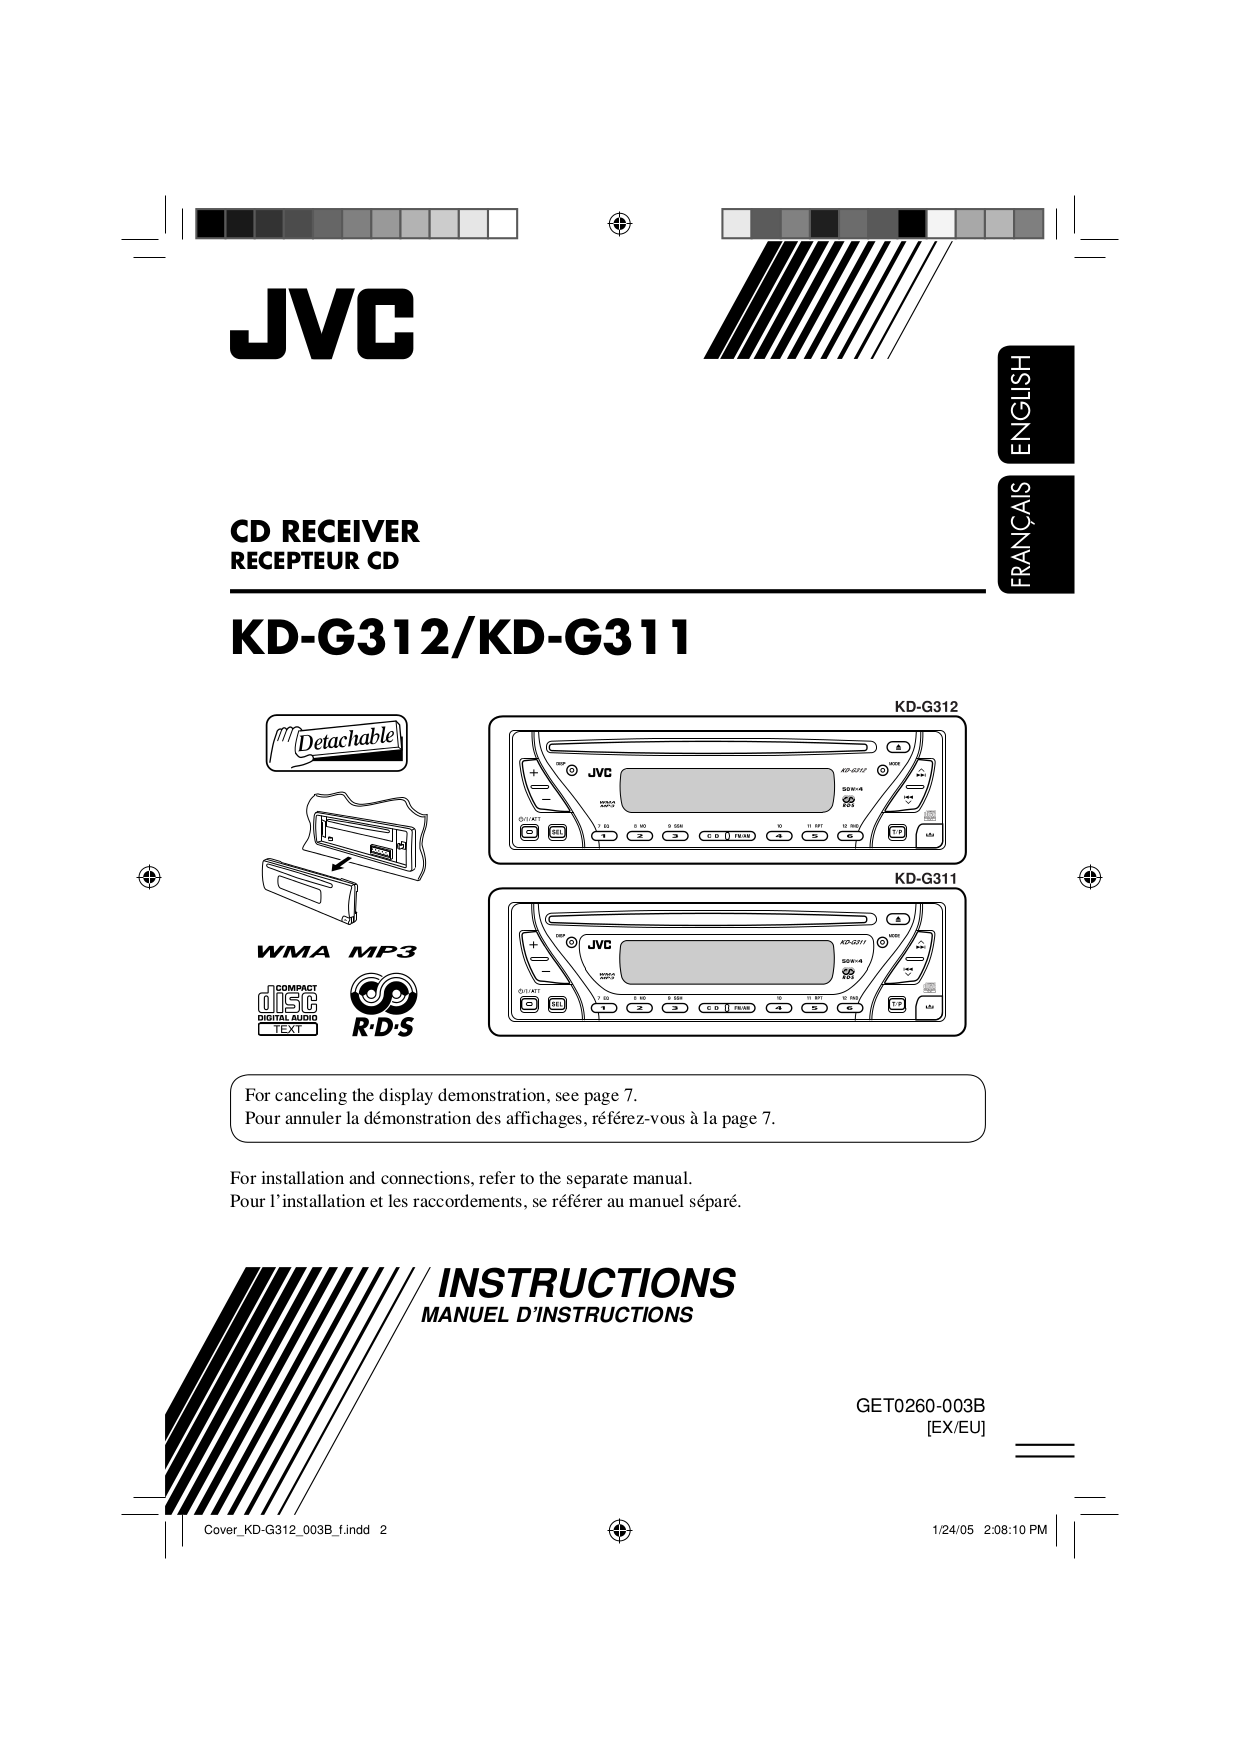 Jvc Kd G331 Wiring Diagram 26 Images G340 Pdf For Car Receiver G312 Manual